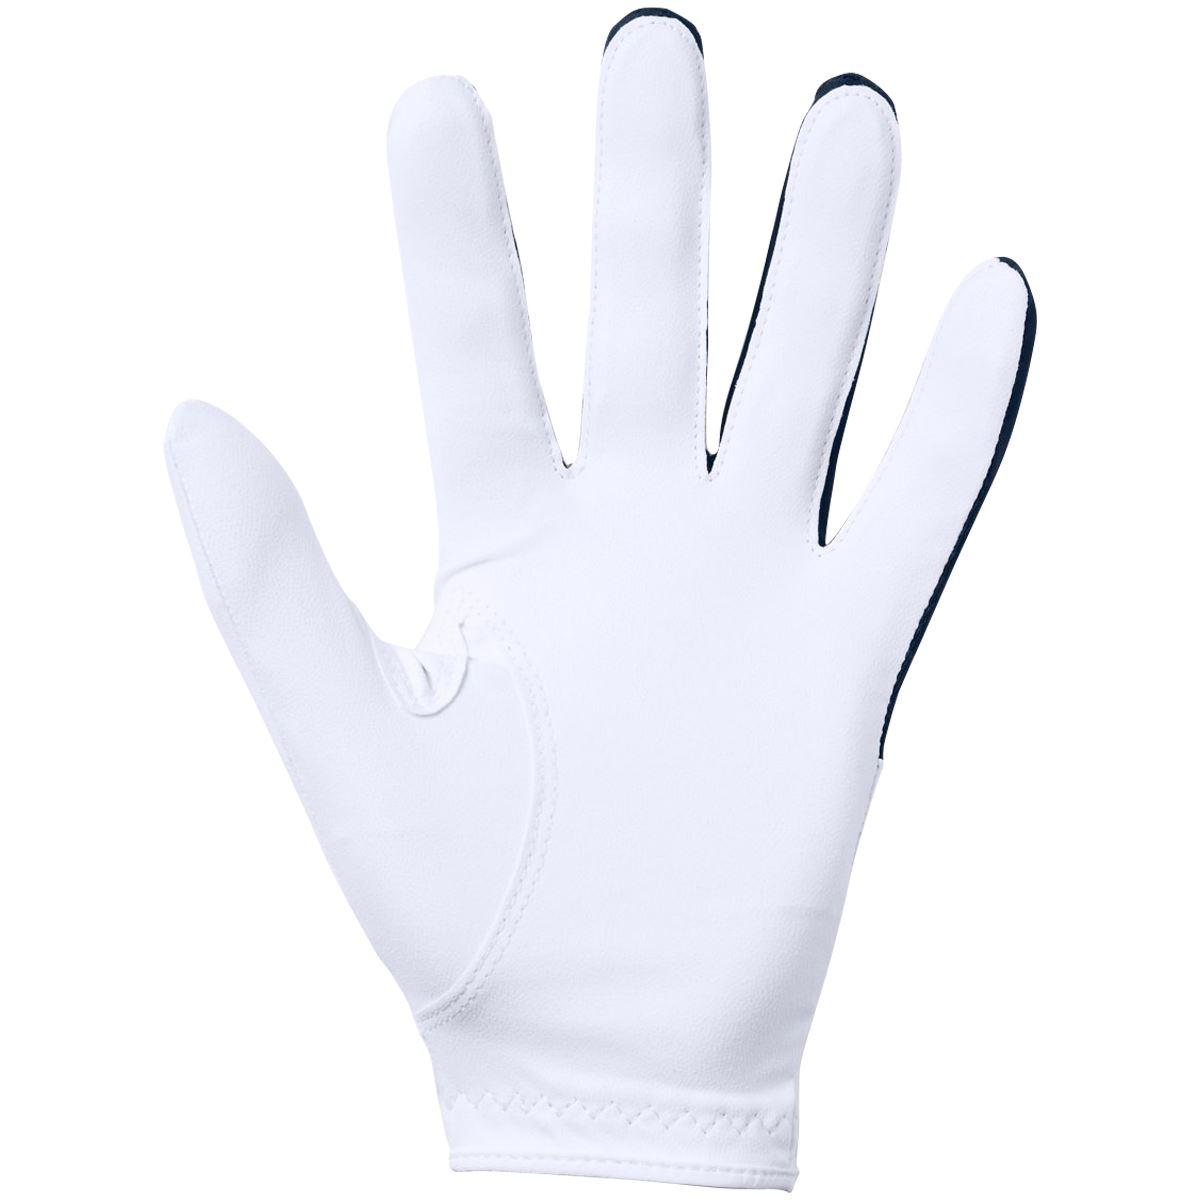 Under-Armour-Golf-Glove-NEW-2019-UA-Medal-Synthetic-Textured-Mens-Left-Hand Indexbild 3